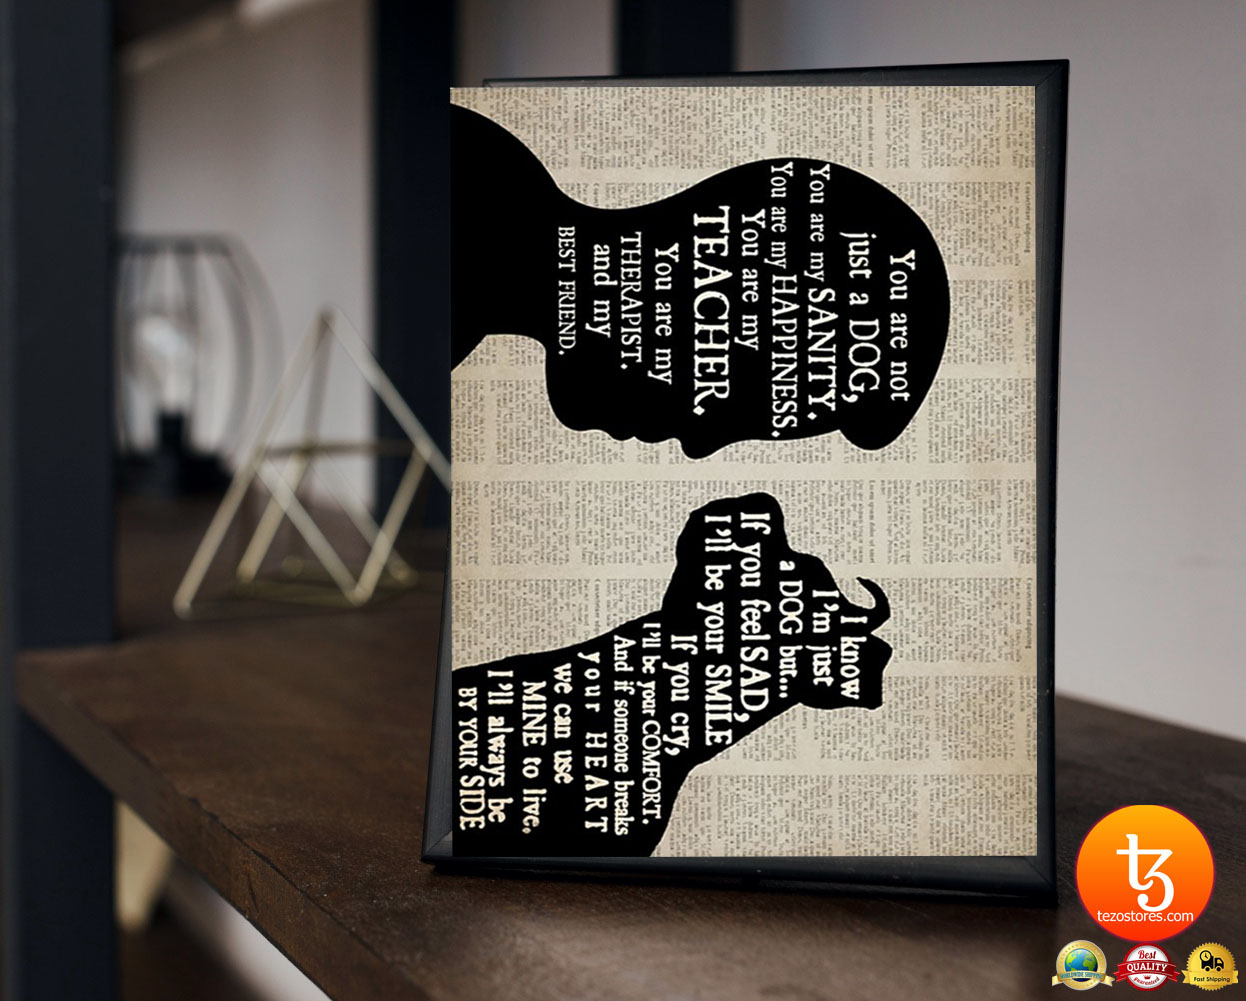 Pitbull boy therapist best friend poster 23